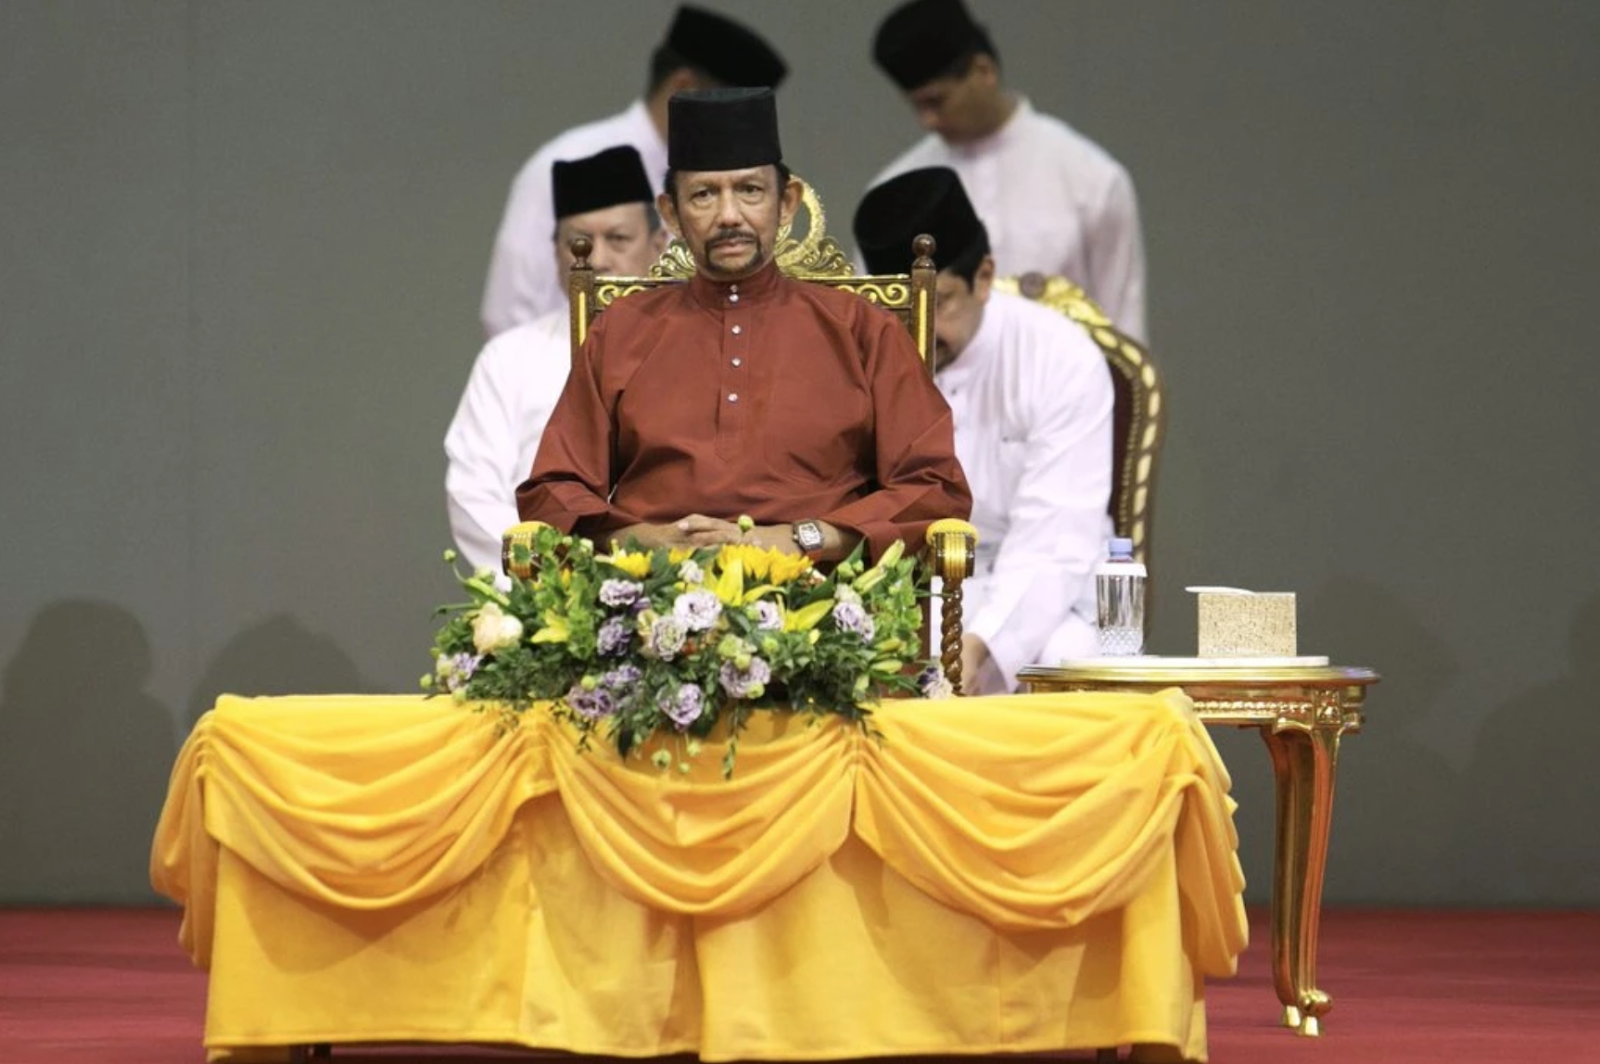 Sultan Hassanal Bolkiah of Brunei in Bandar Seri Begawan, the country's capital, on Wednesday.  Photo:  Iliana Magra/New York Times via Shutterstock